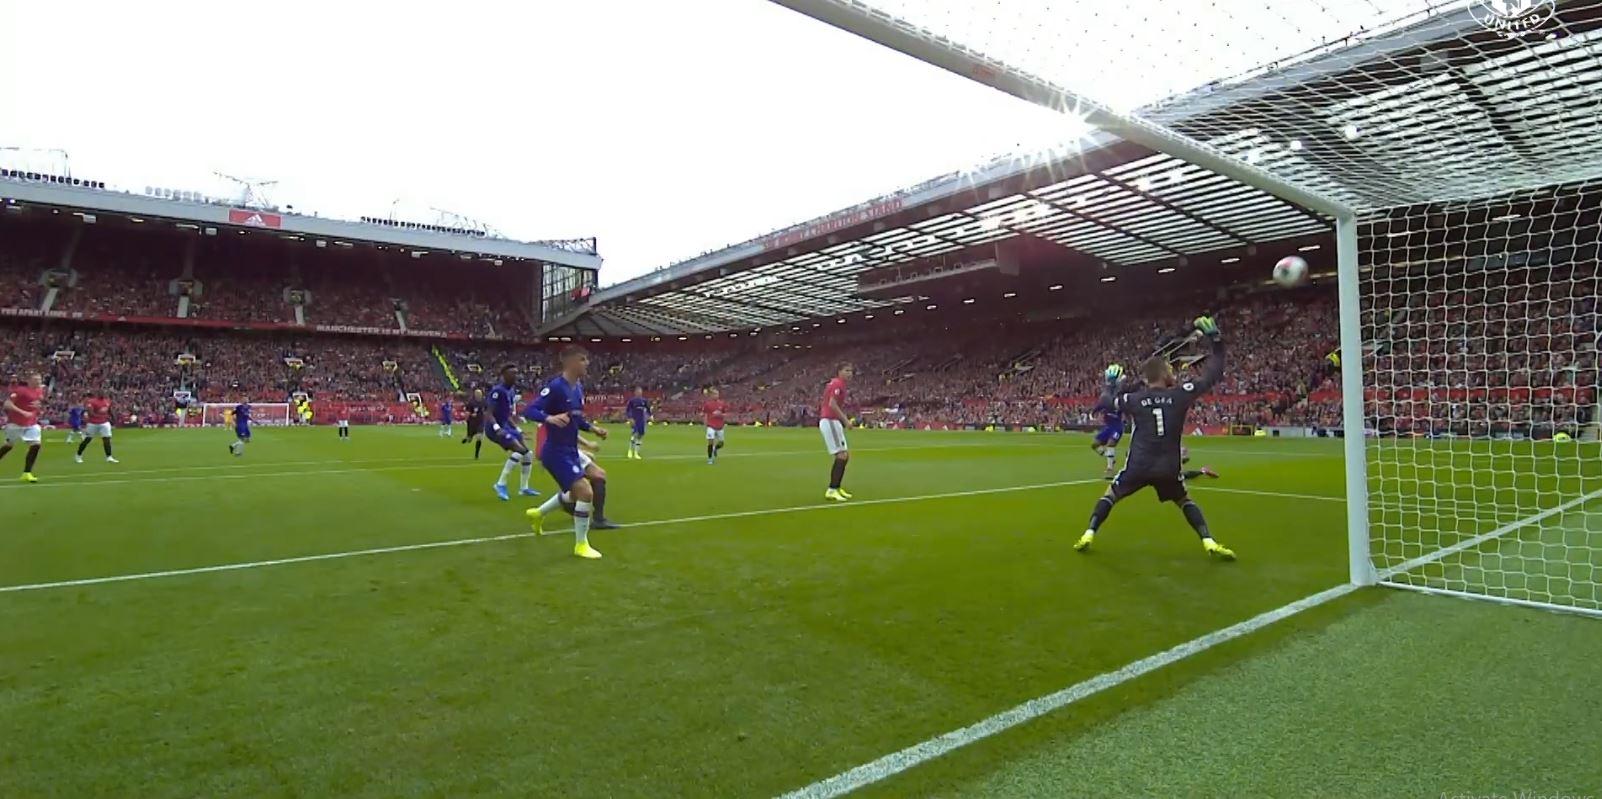 Manchester United fiton 4-0 kundër Chelsea